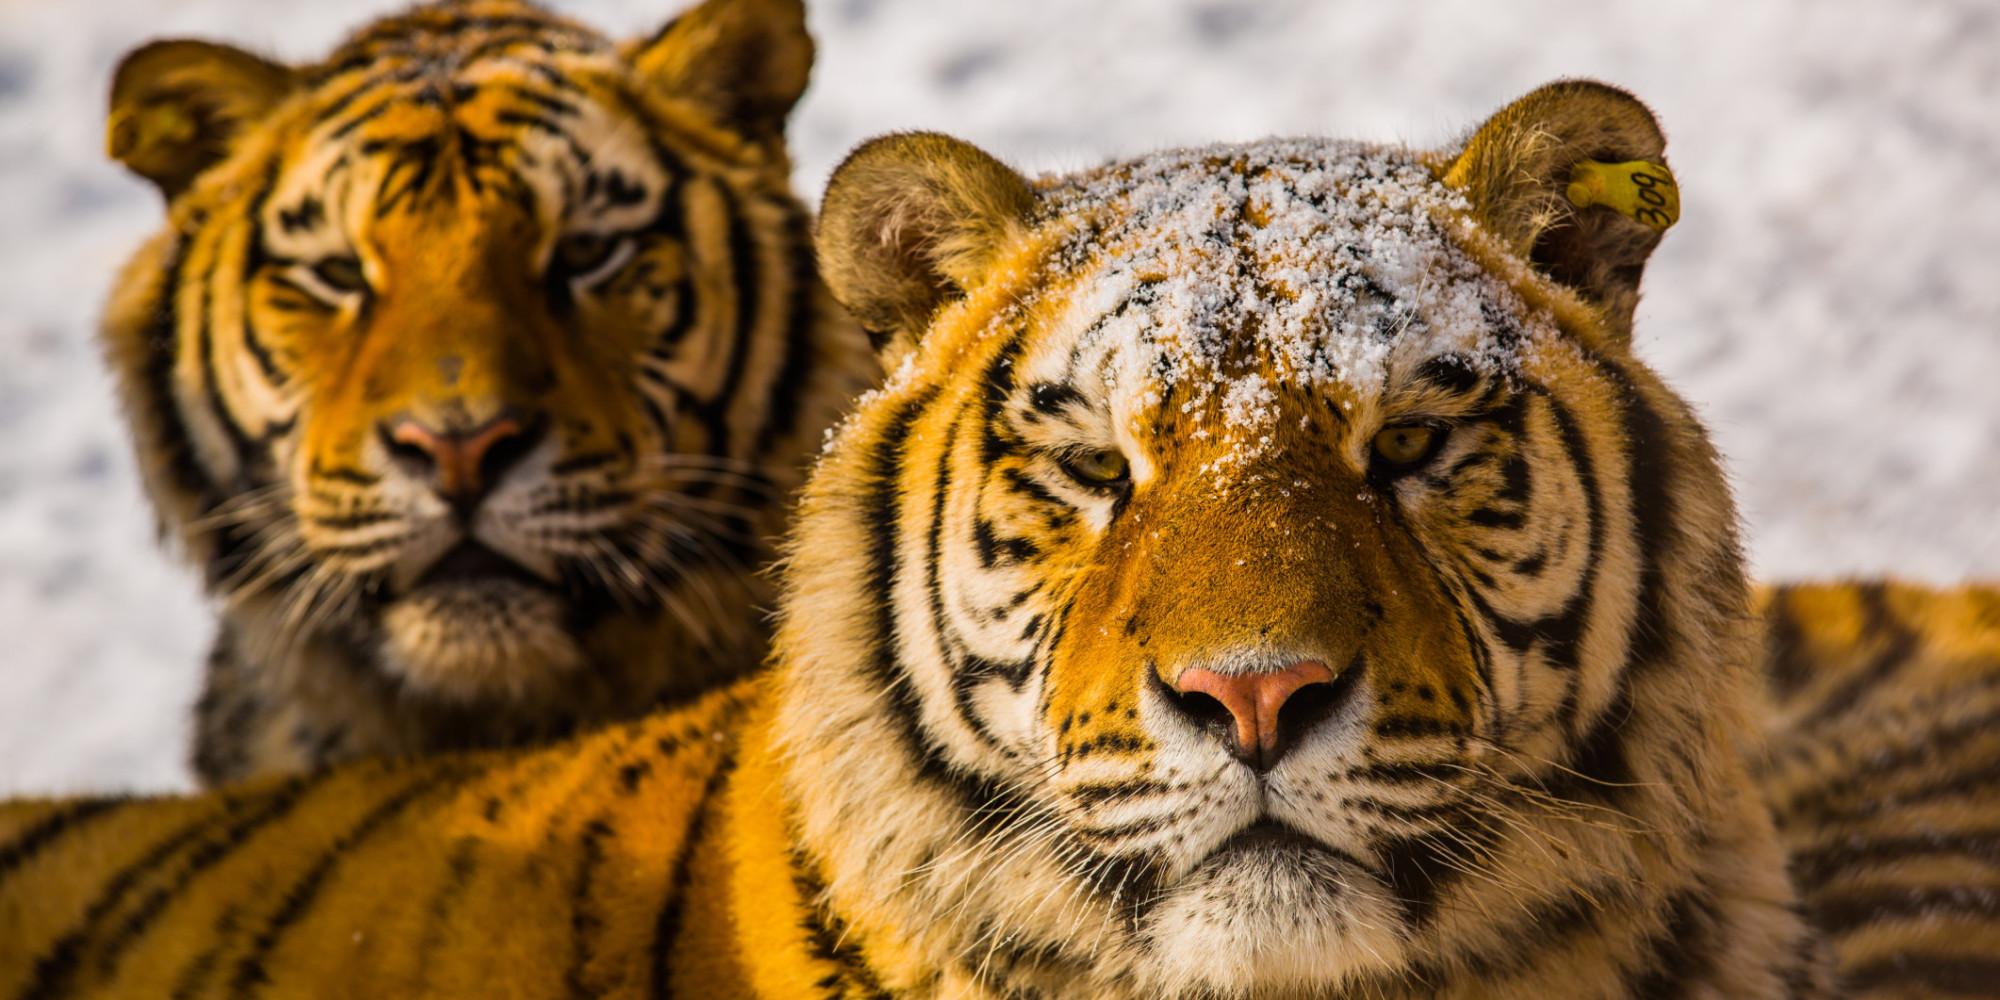 tiger - photo #8